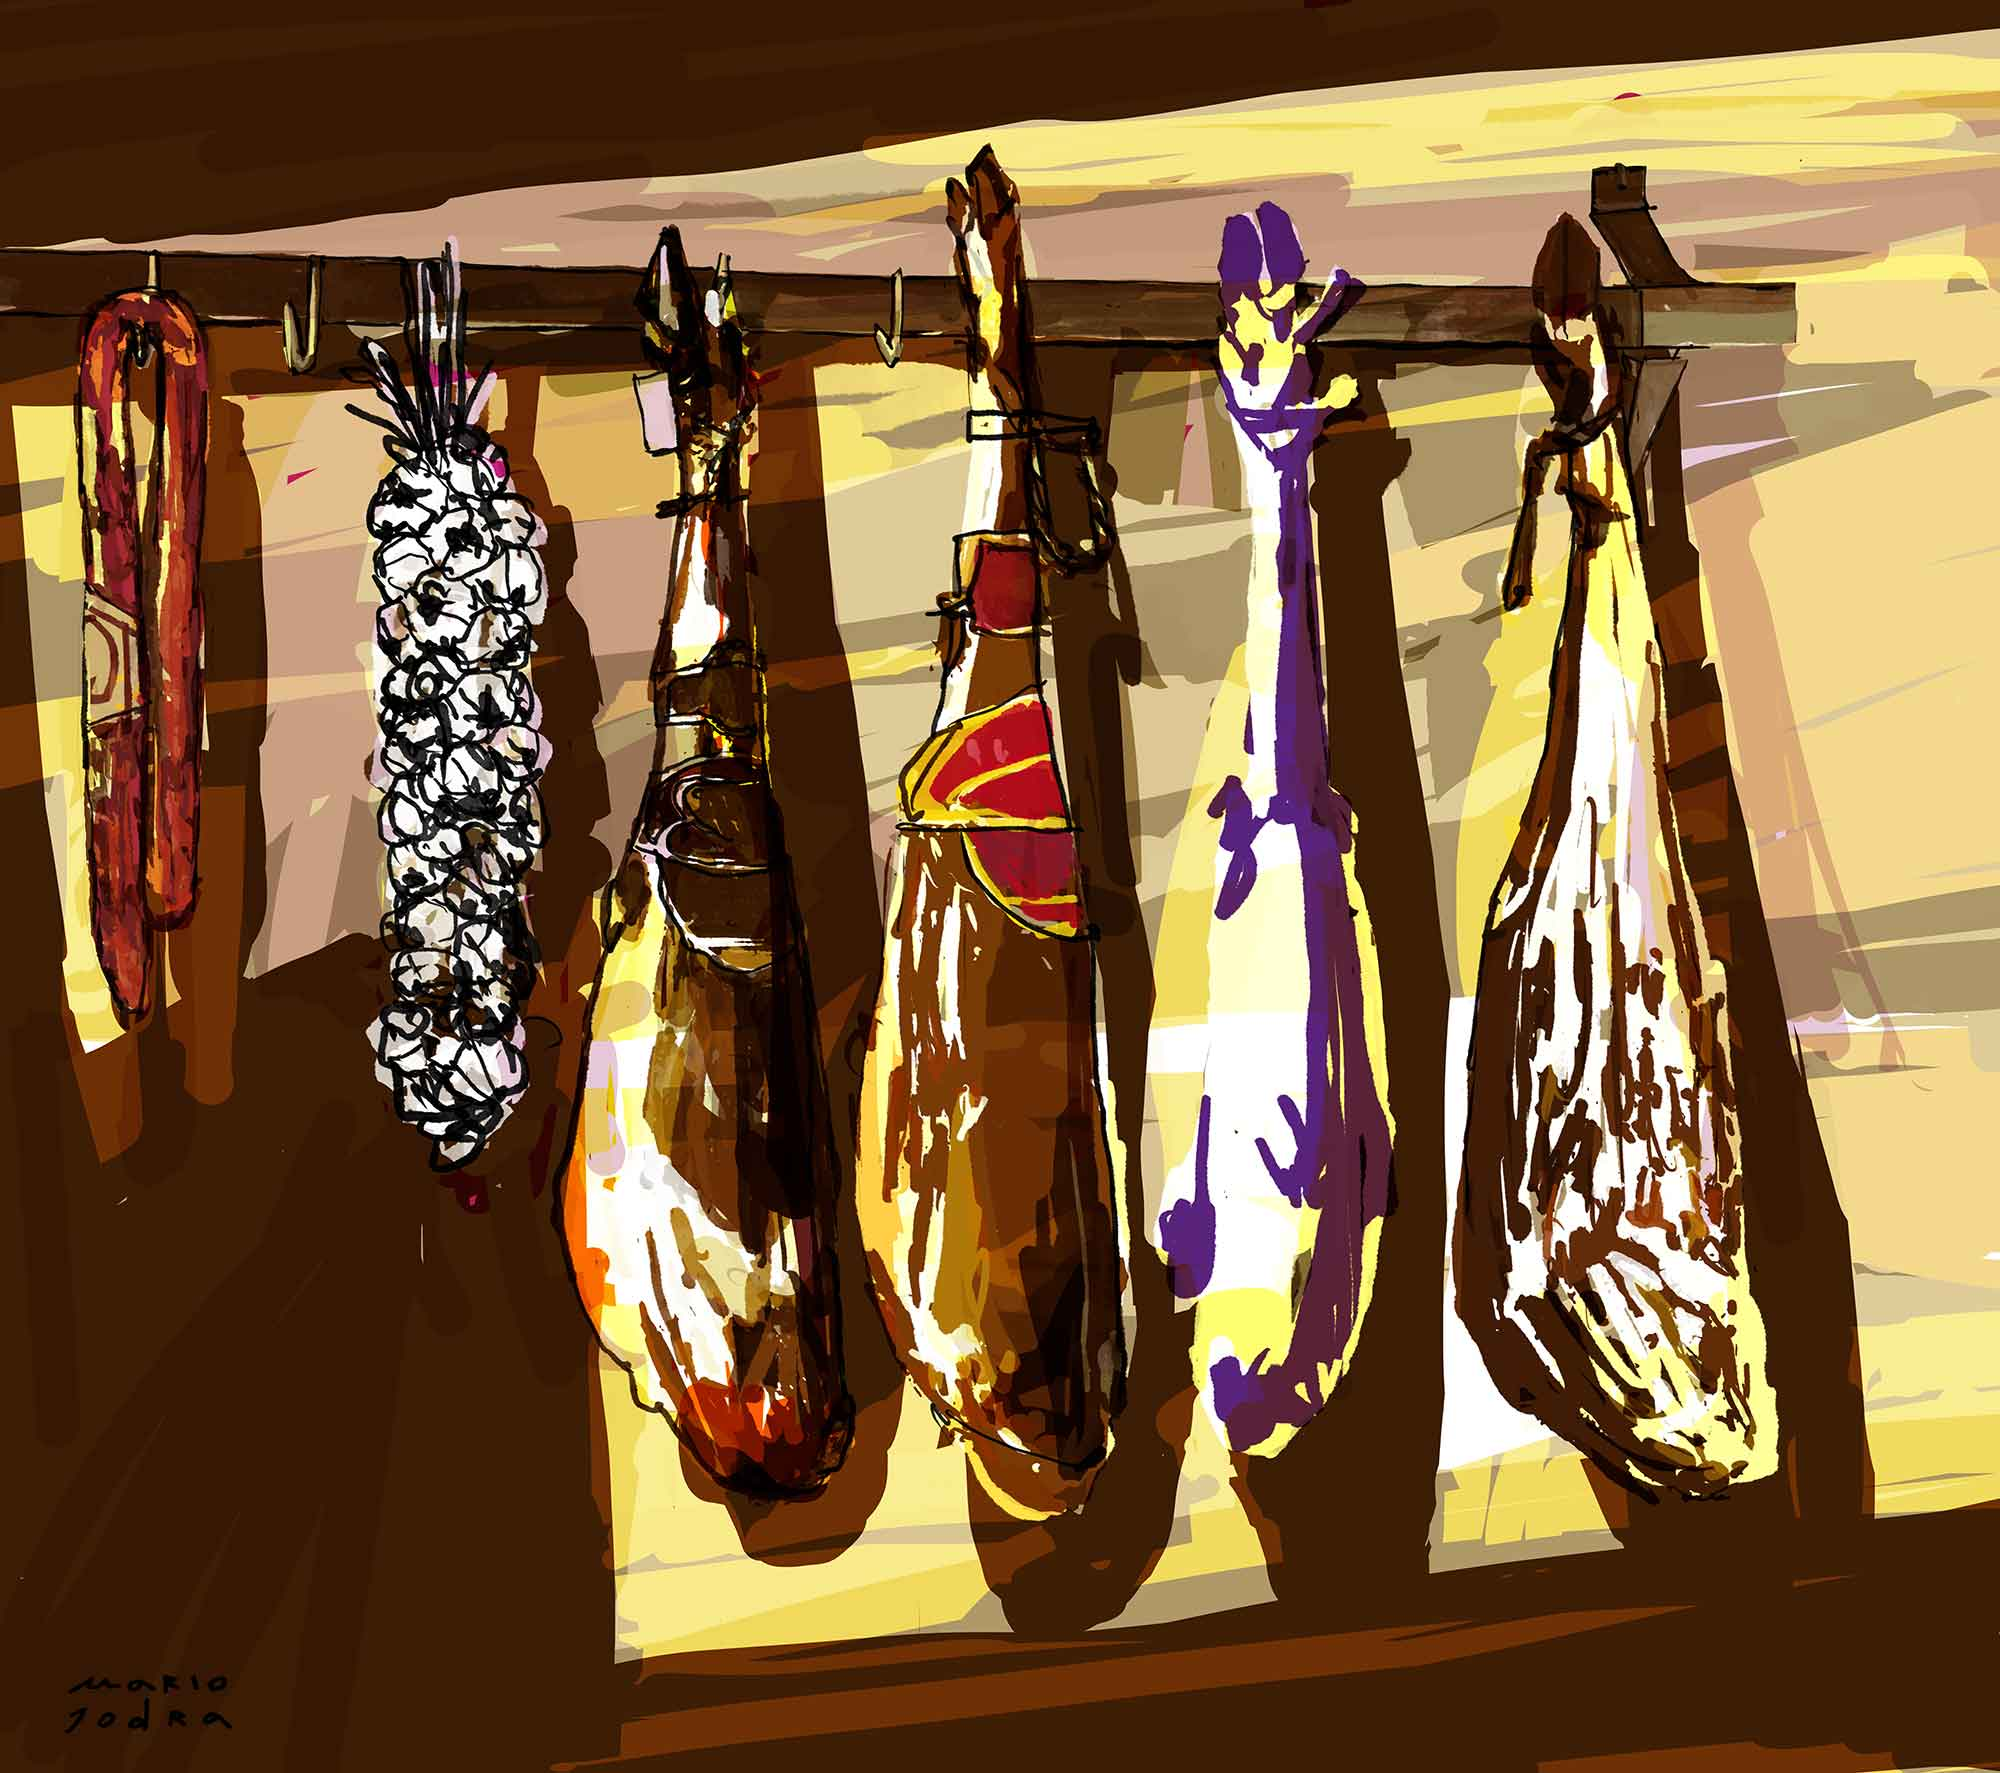 Mario Jodra illustration - Hanging ham